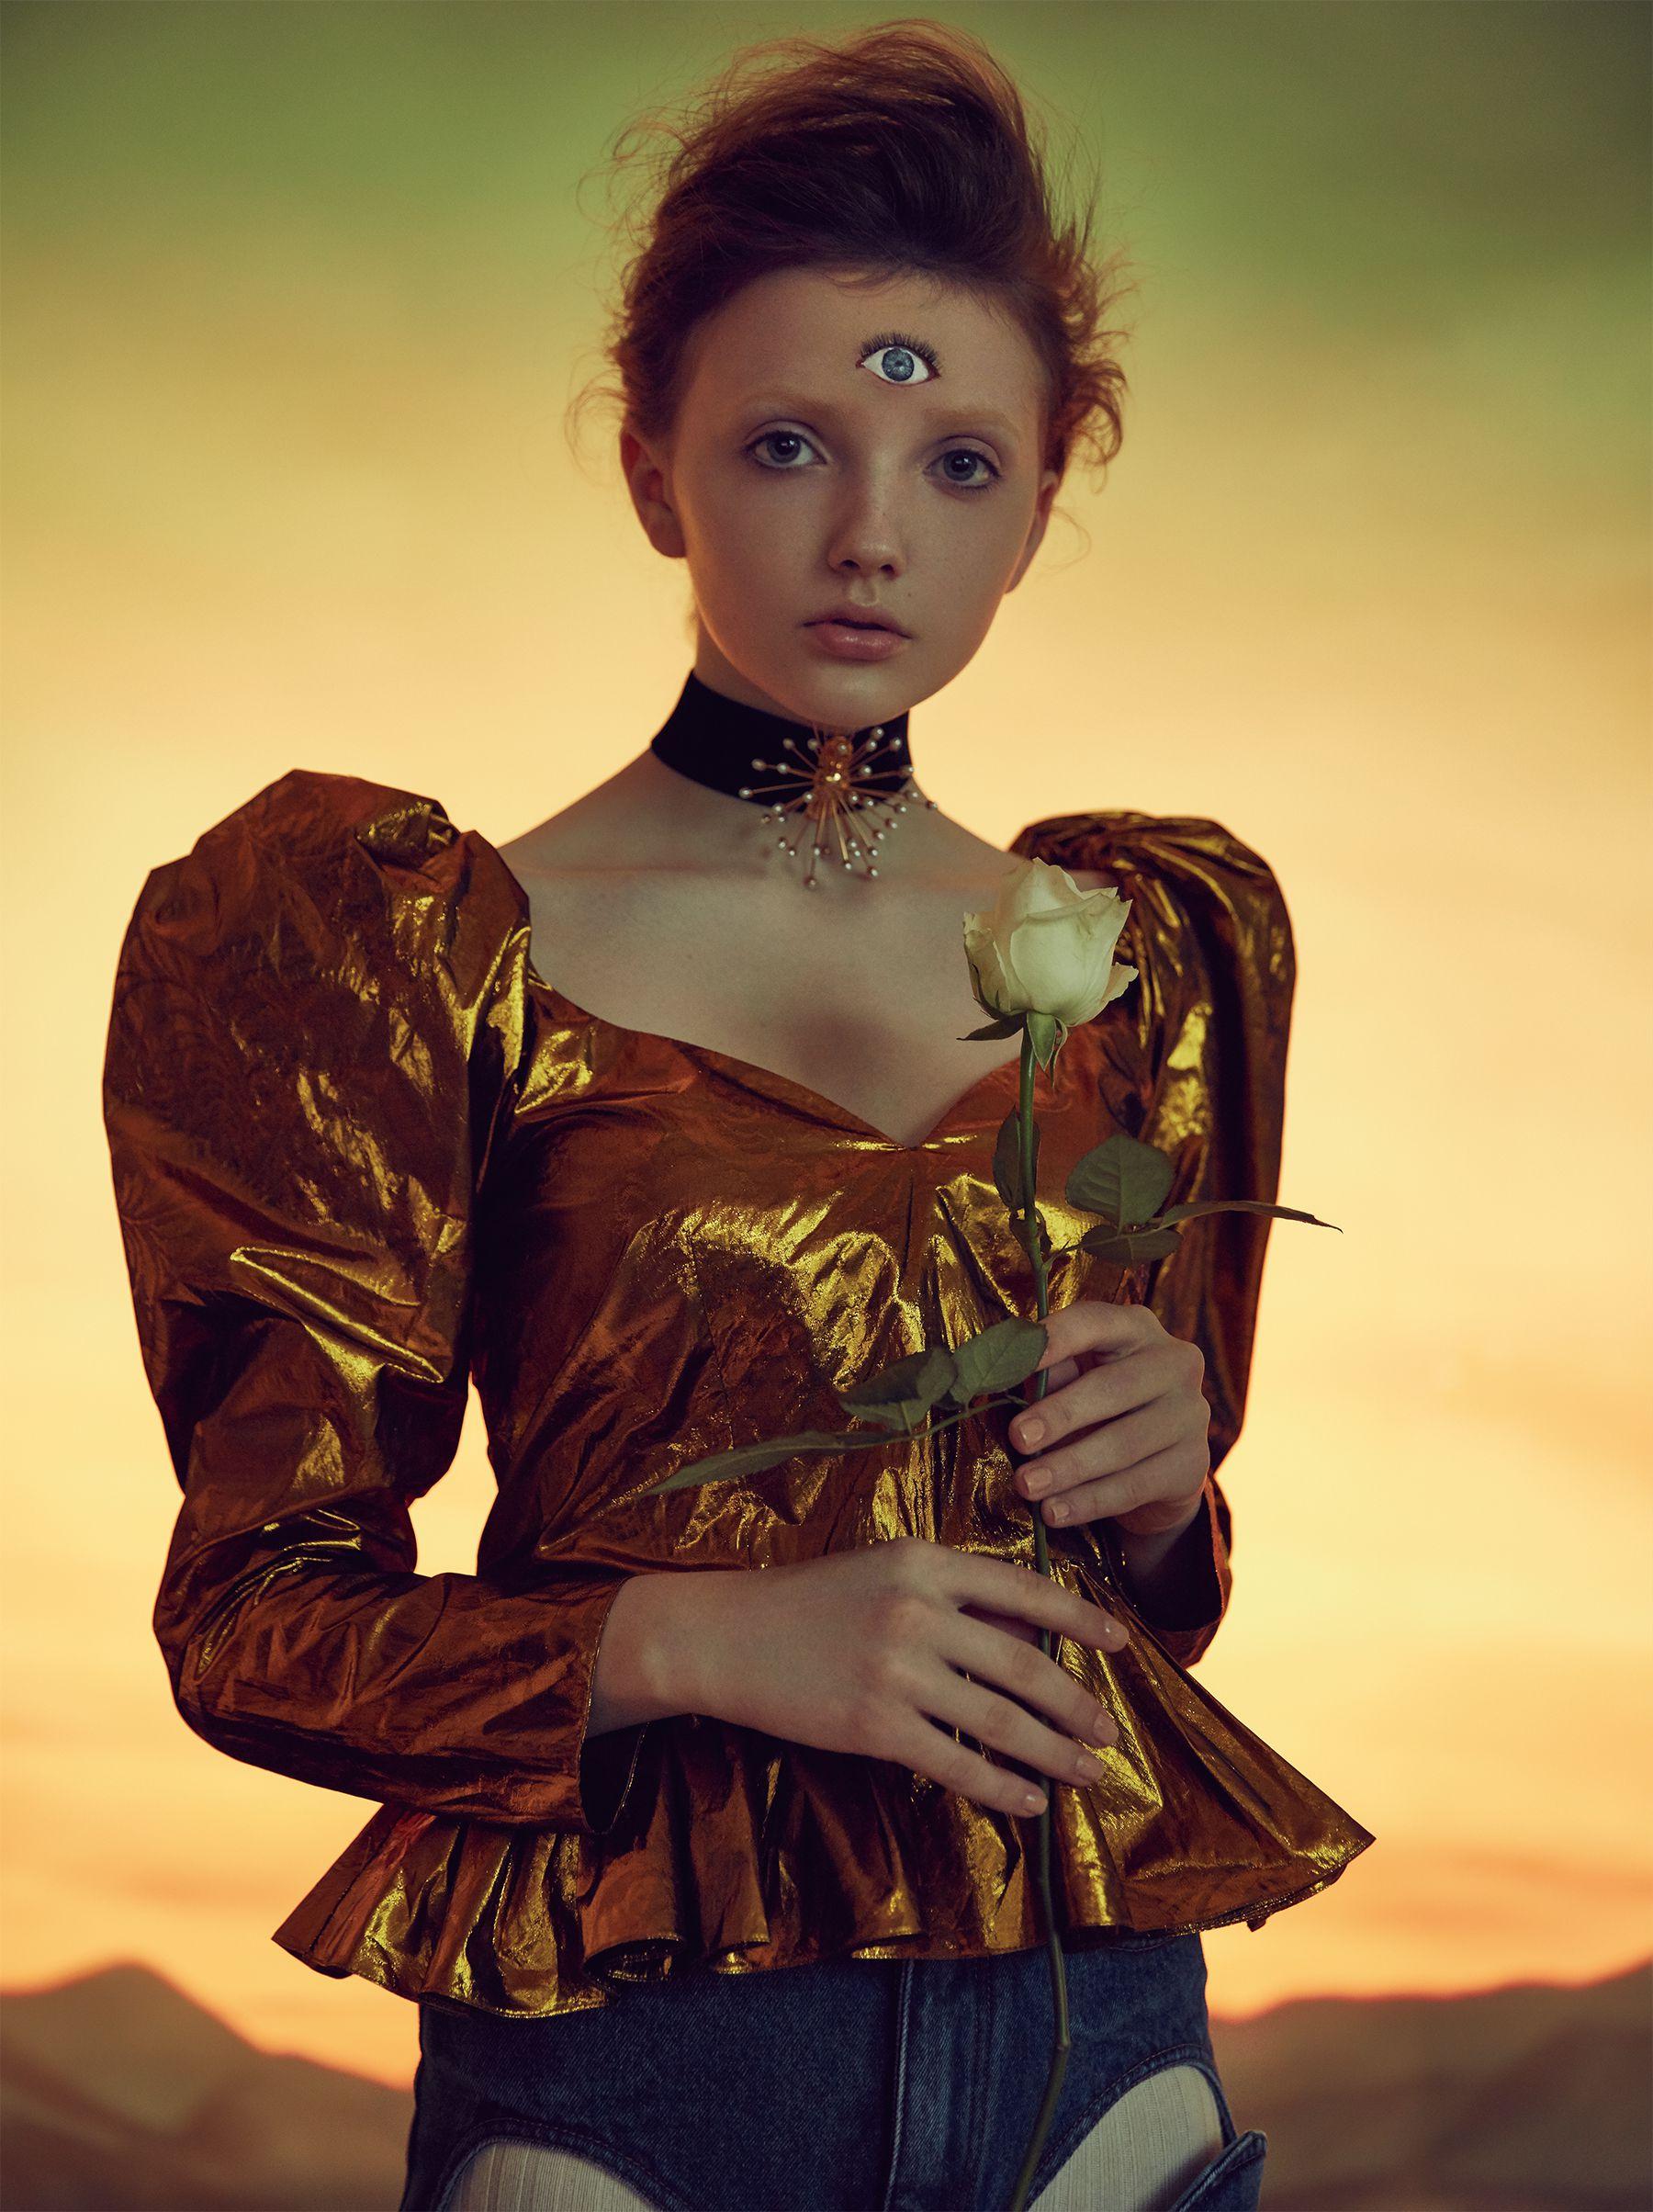 上衣,Stella McCartney;短褲,Y/Project at Net-a-Porter;項鍊,Ellery at Net-a-Porter。